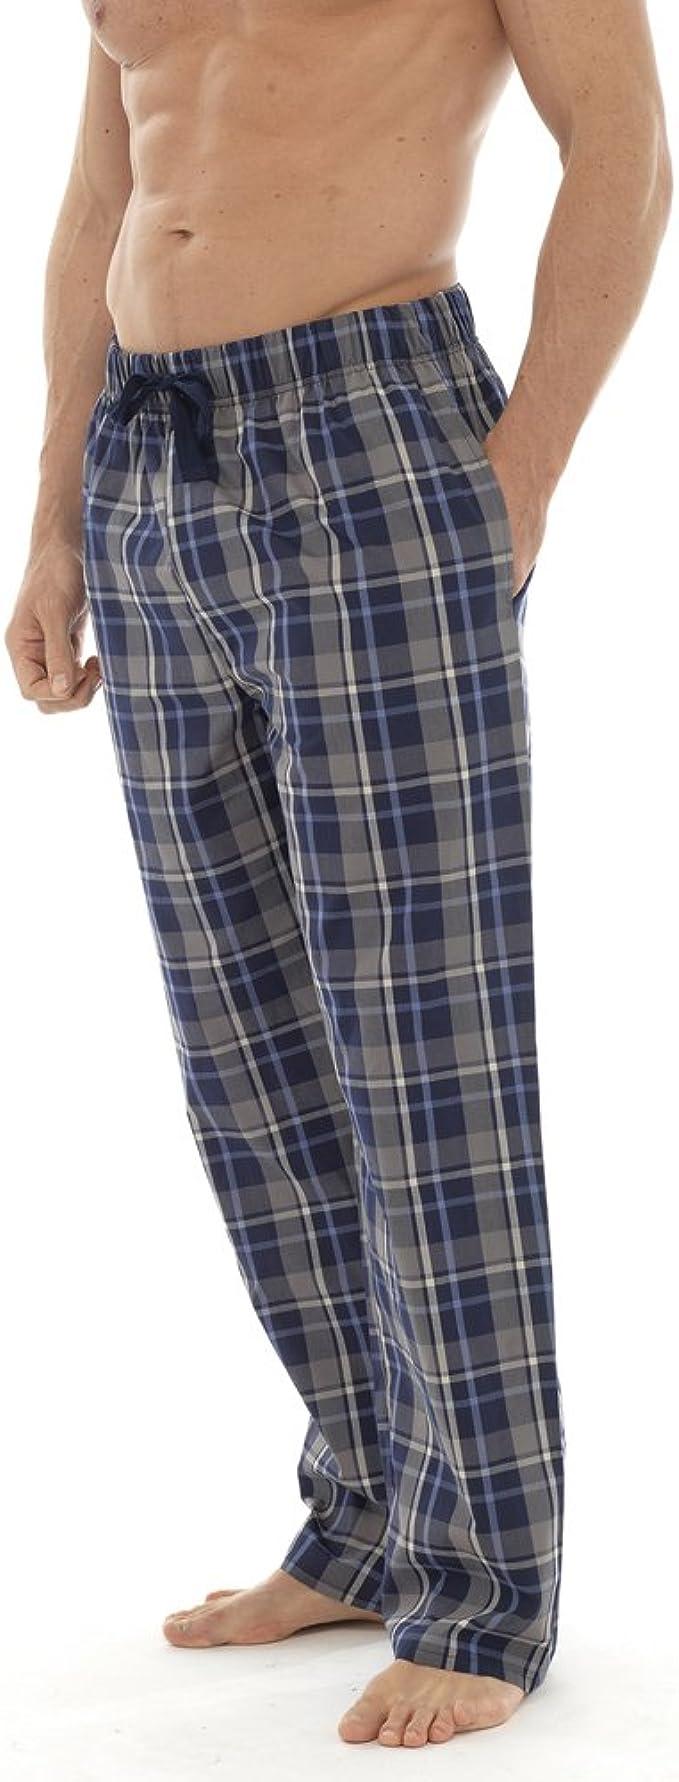 Clothing Unit Mens Lounge Pants Pyjamas with Pockets Bottoms